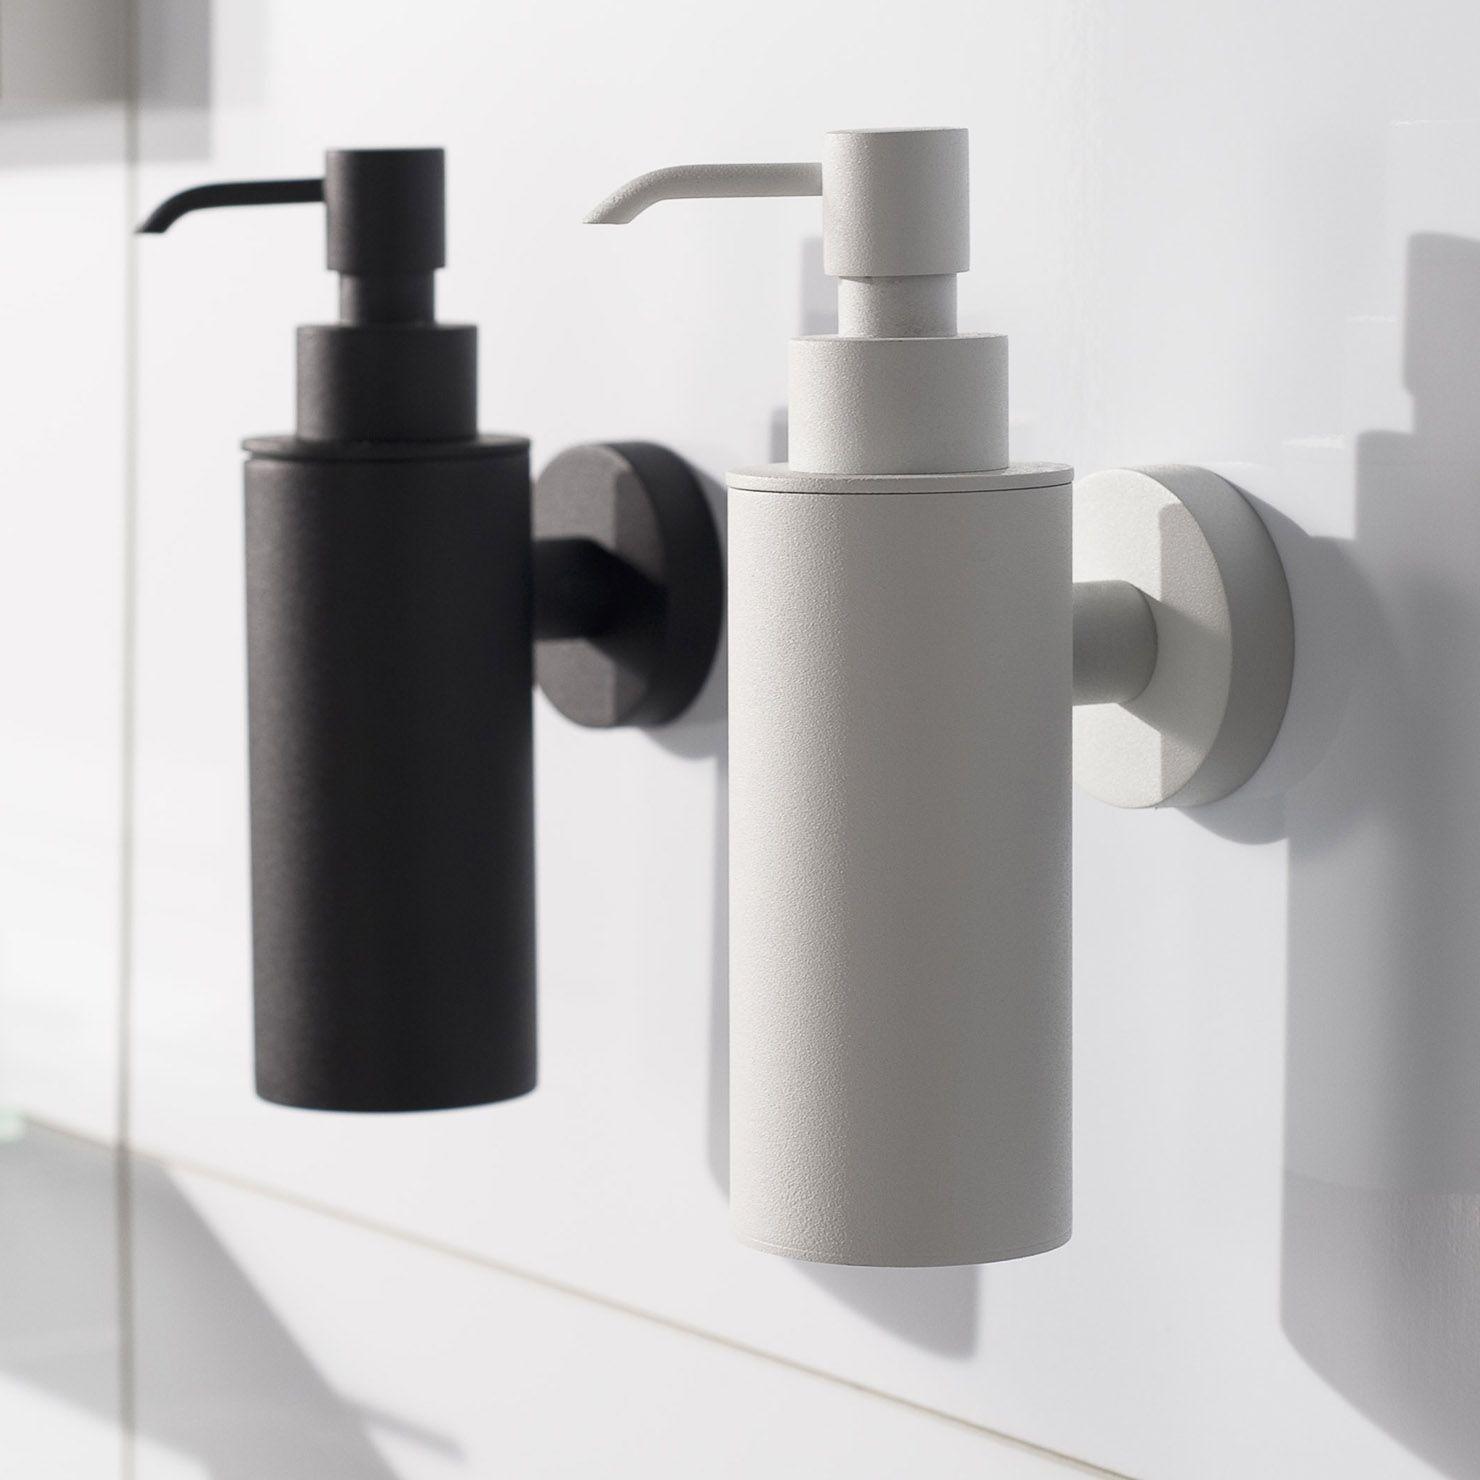 Haceka Kosmos Metal Soap Dispenser Black In 2019 Shower Soap Dispenser Bathroom Soap